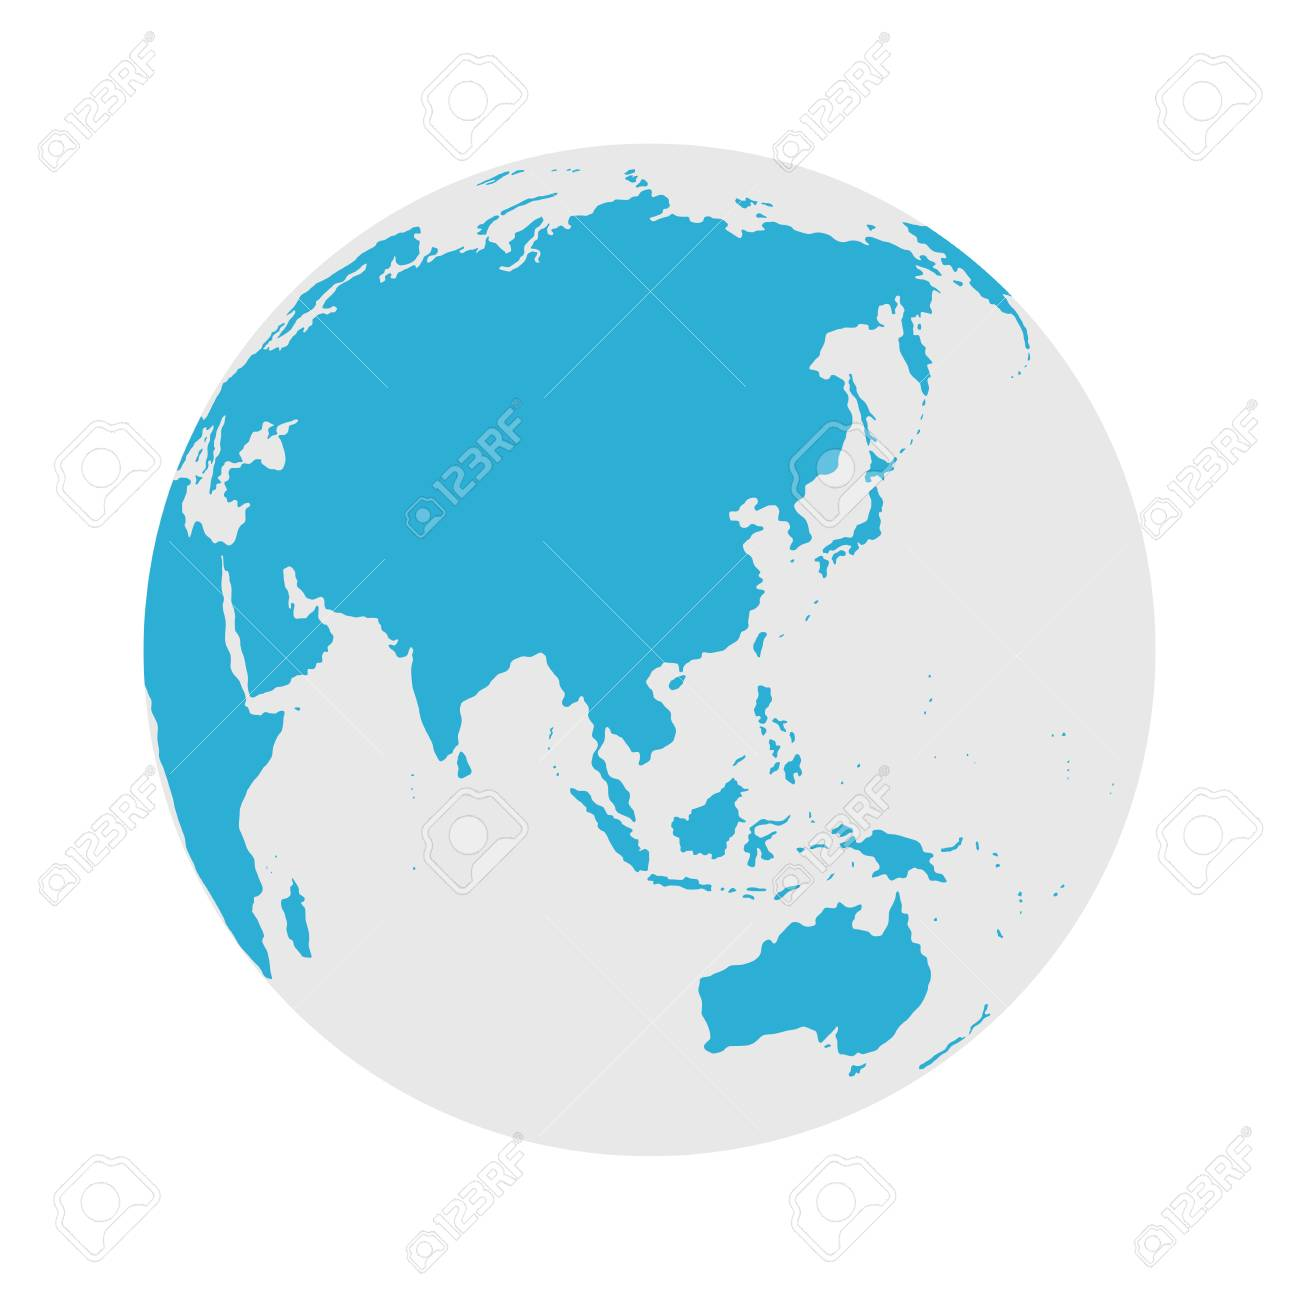 Globe Icon - Round World Map Flat Vector Illustration - 128499750